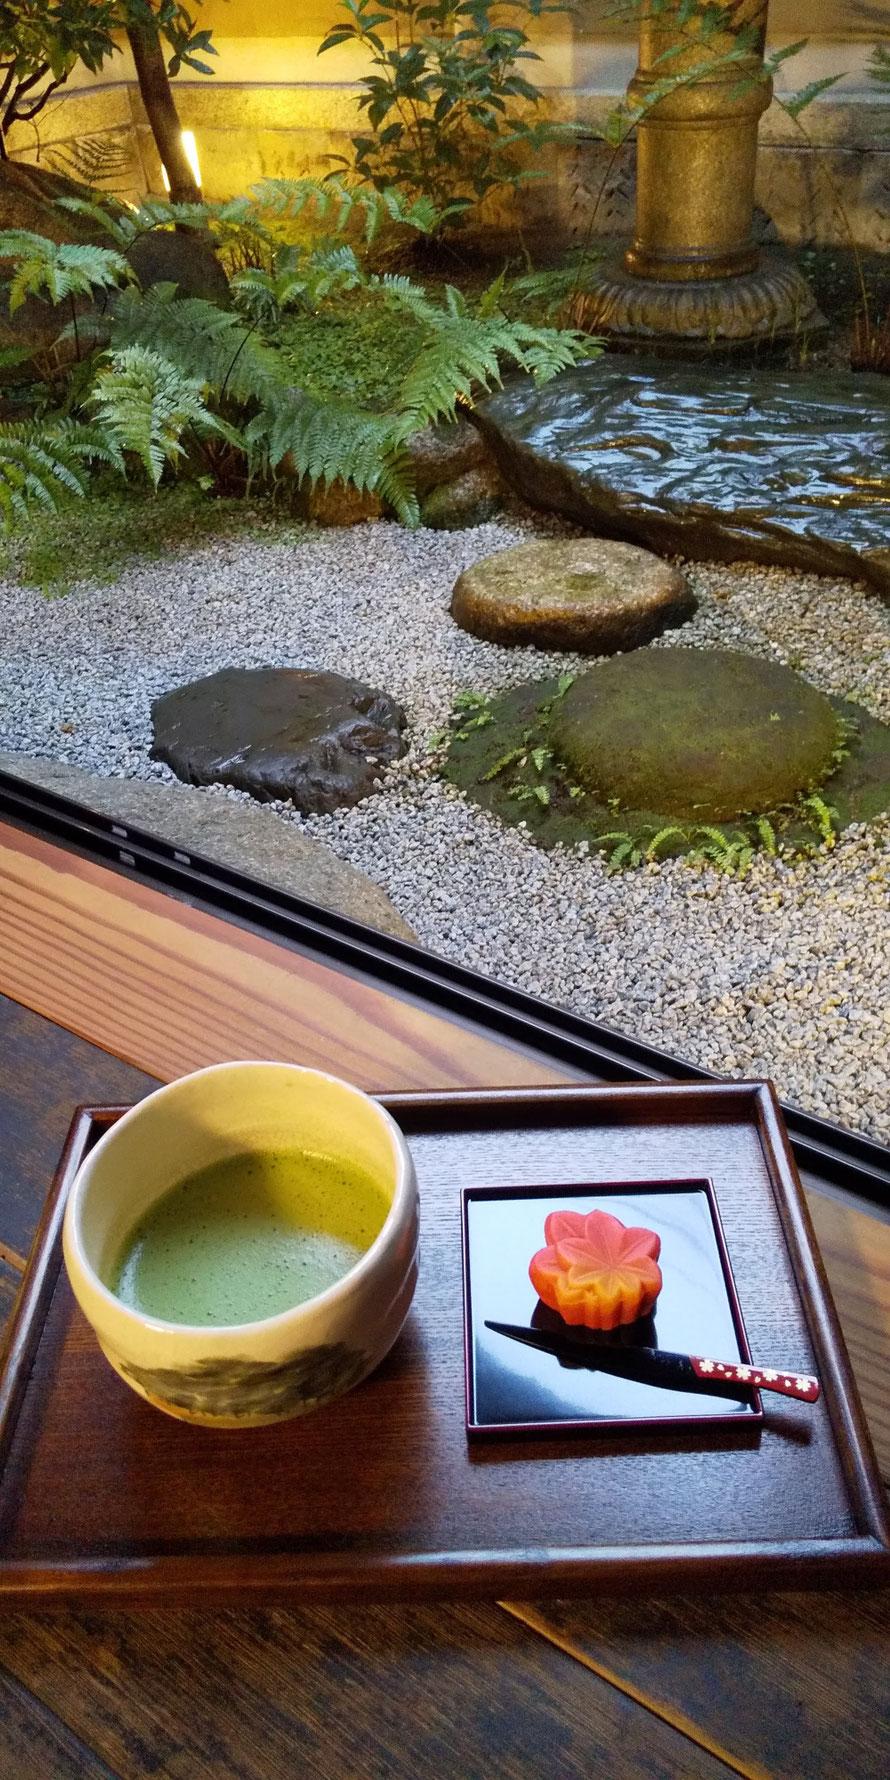 抹茶(和束産)と主菓子